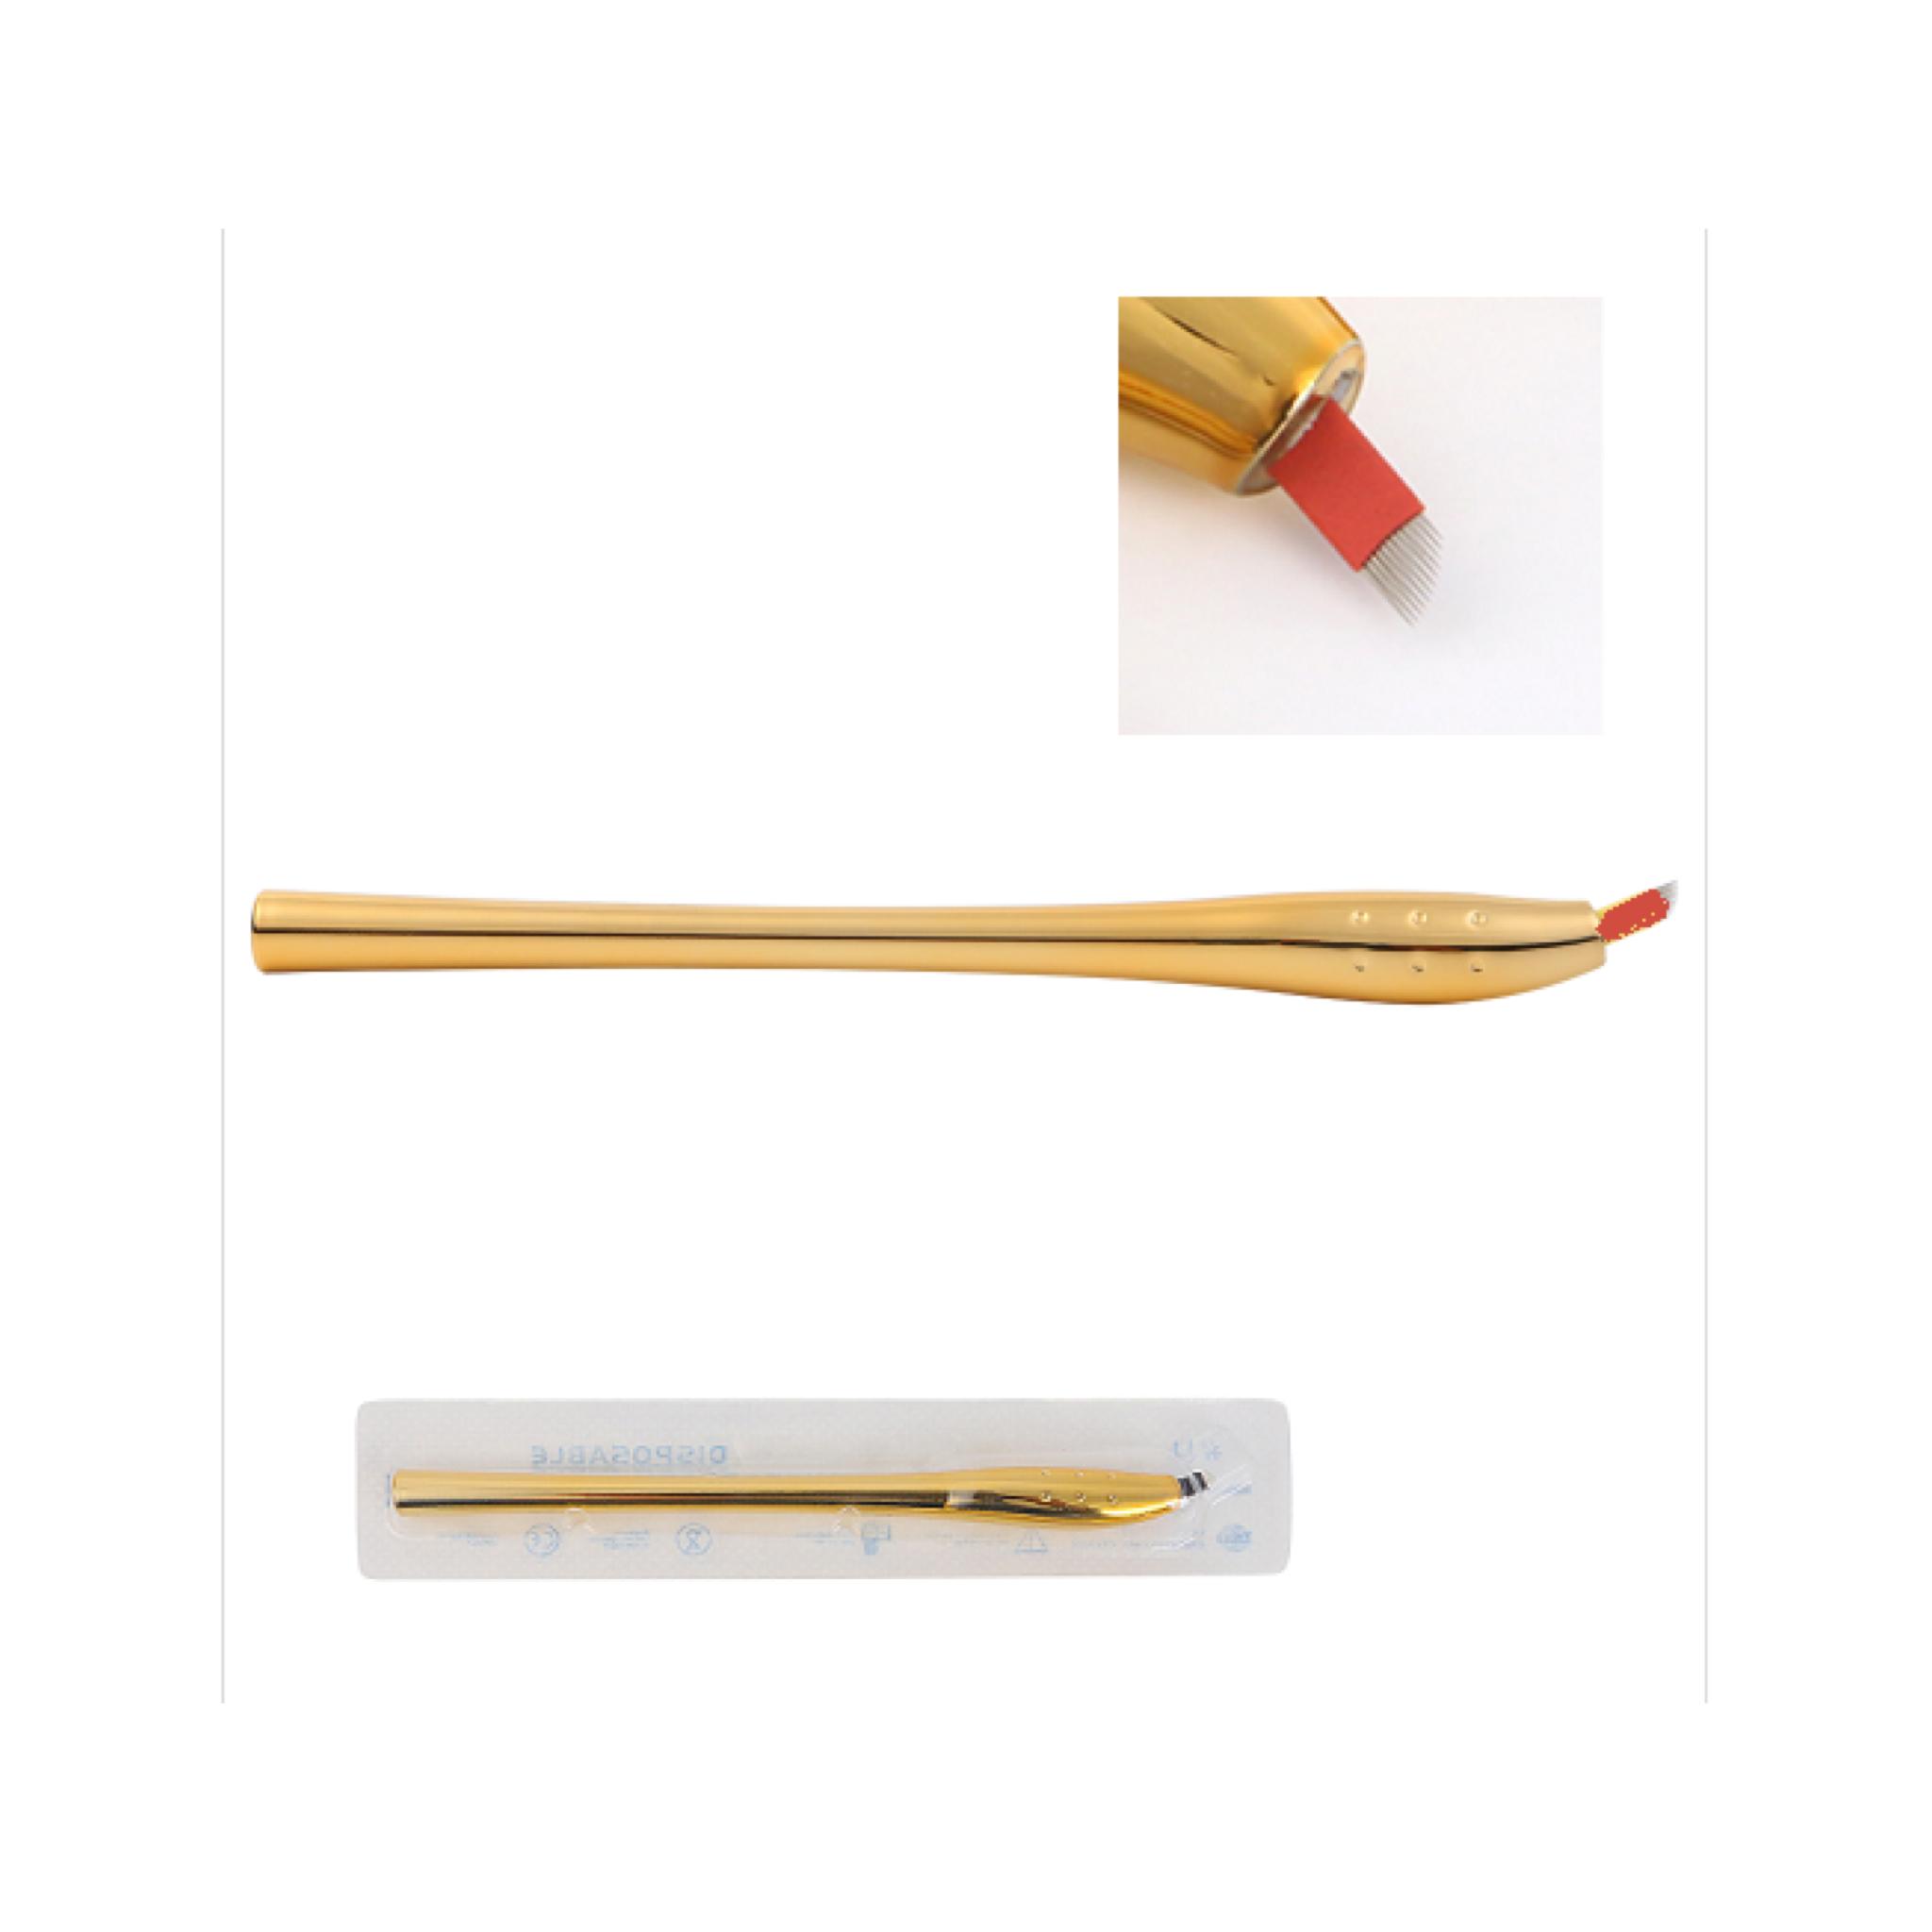 Microbladingnål och penna / Microblading needle and pen 0,25 mm